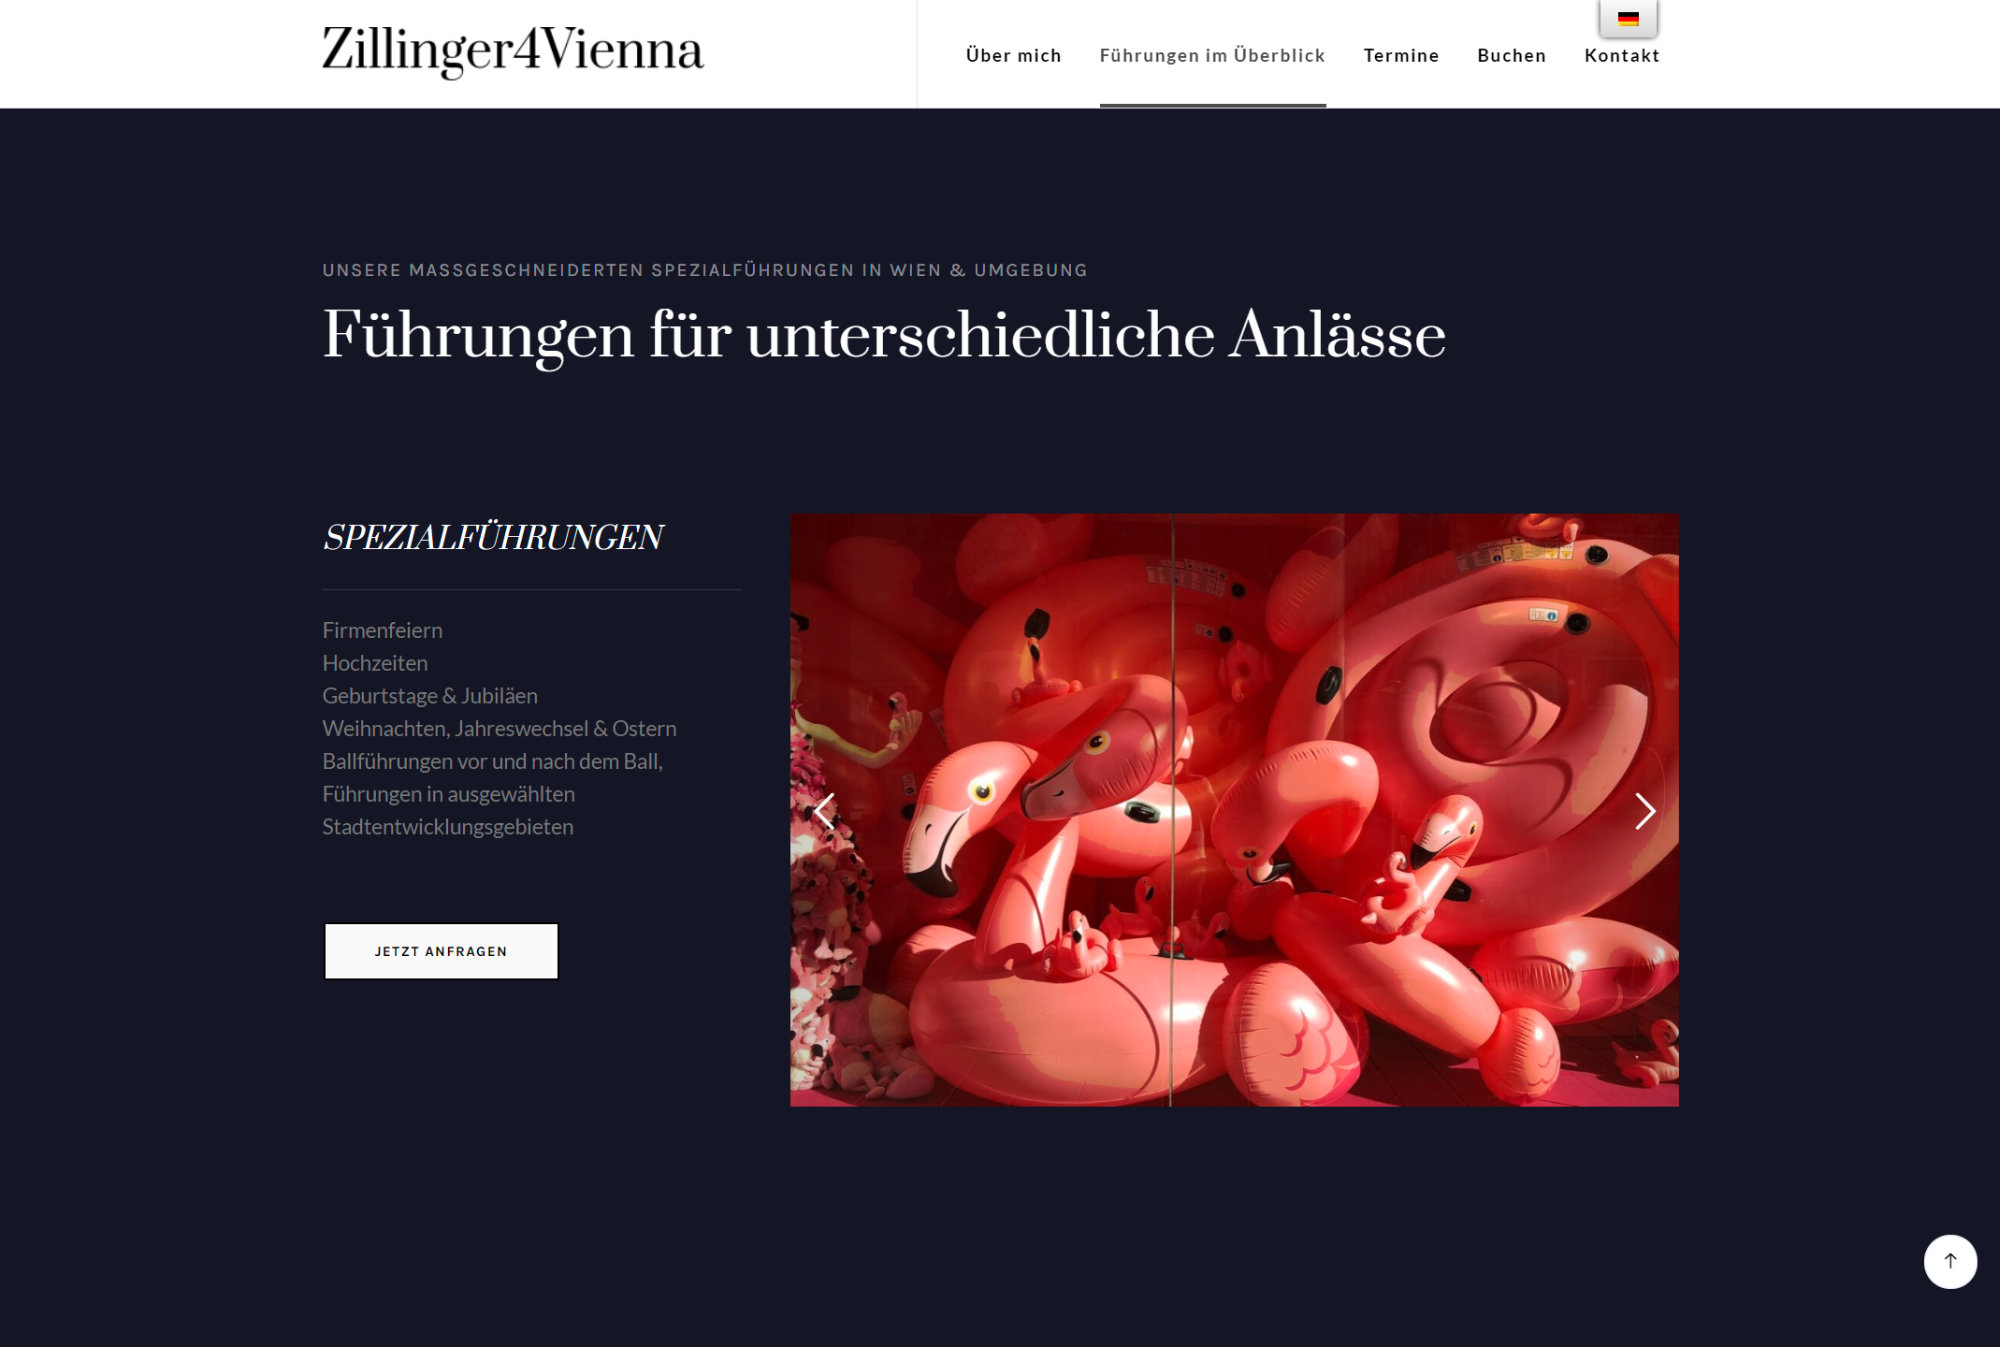 whateverworks-Zillinger4Vienna-A